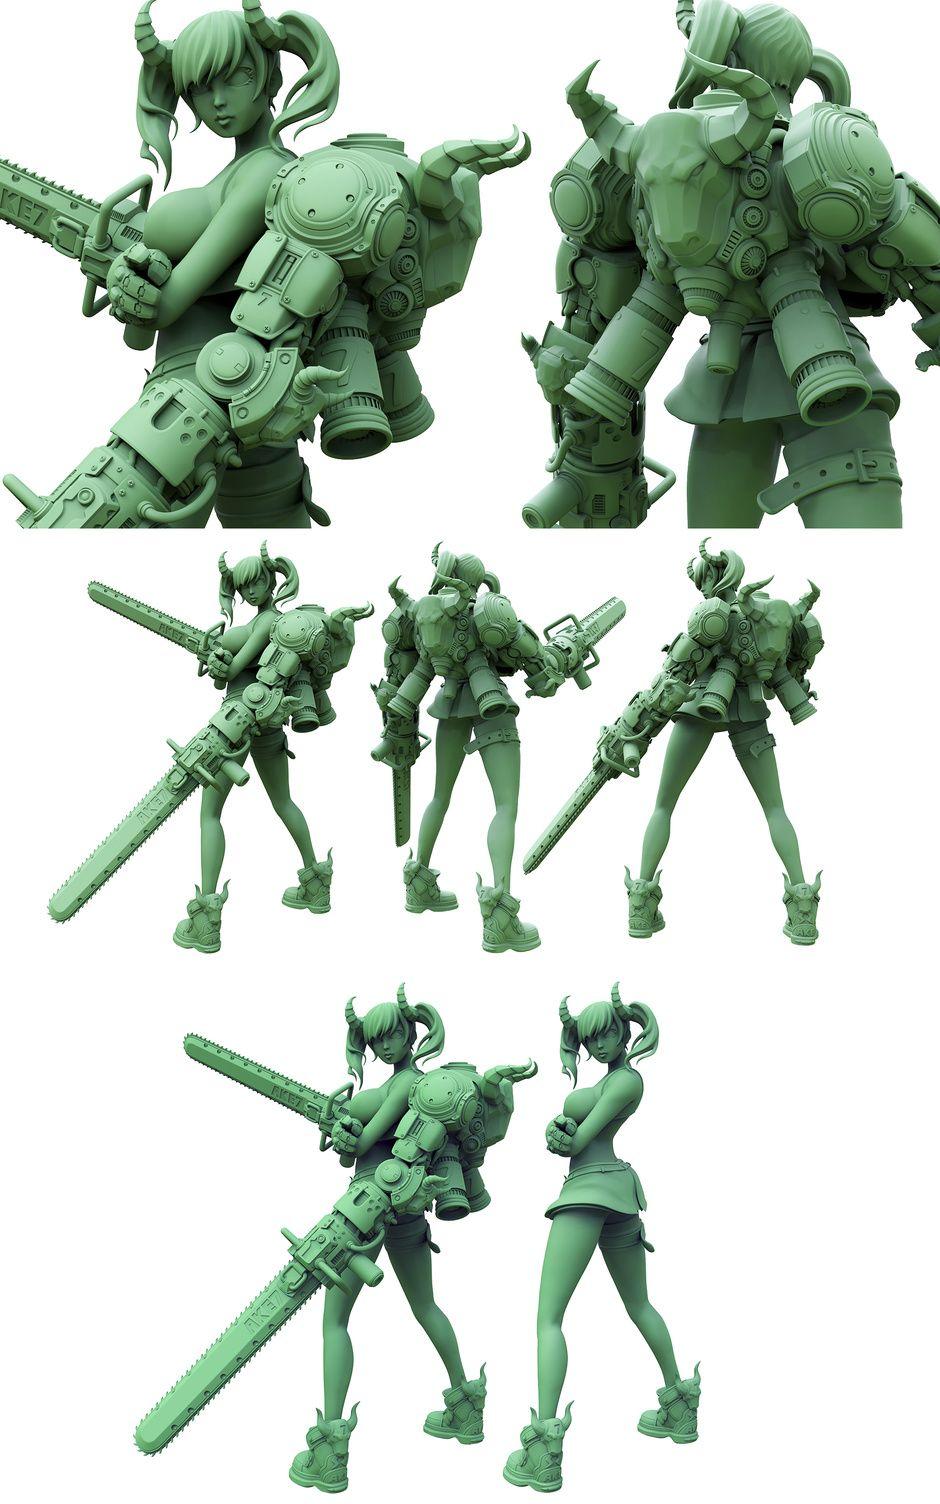 Anime style character sculpt by kieran mckay anime 3d